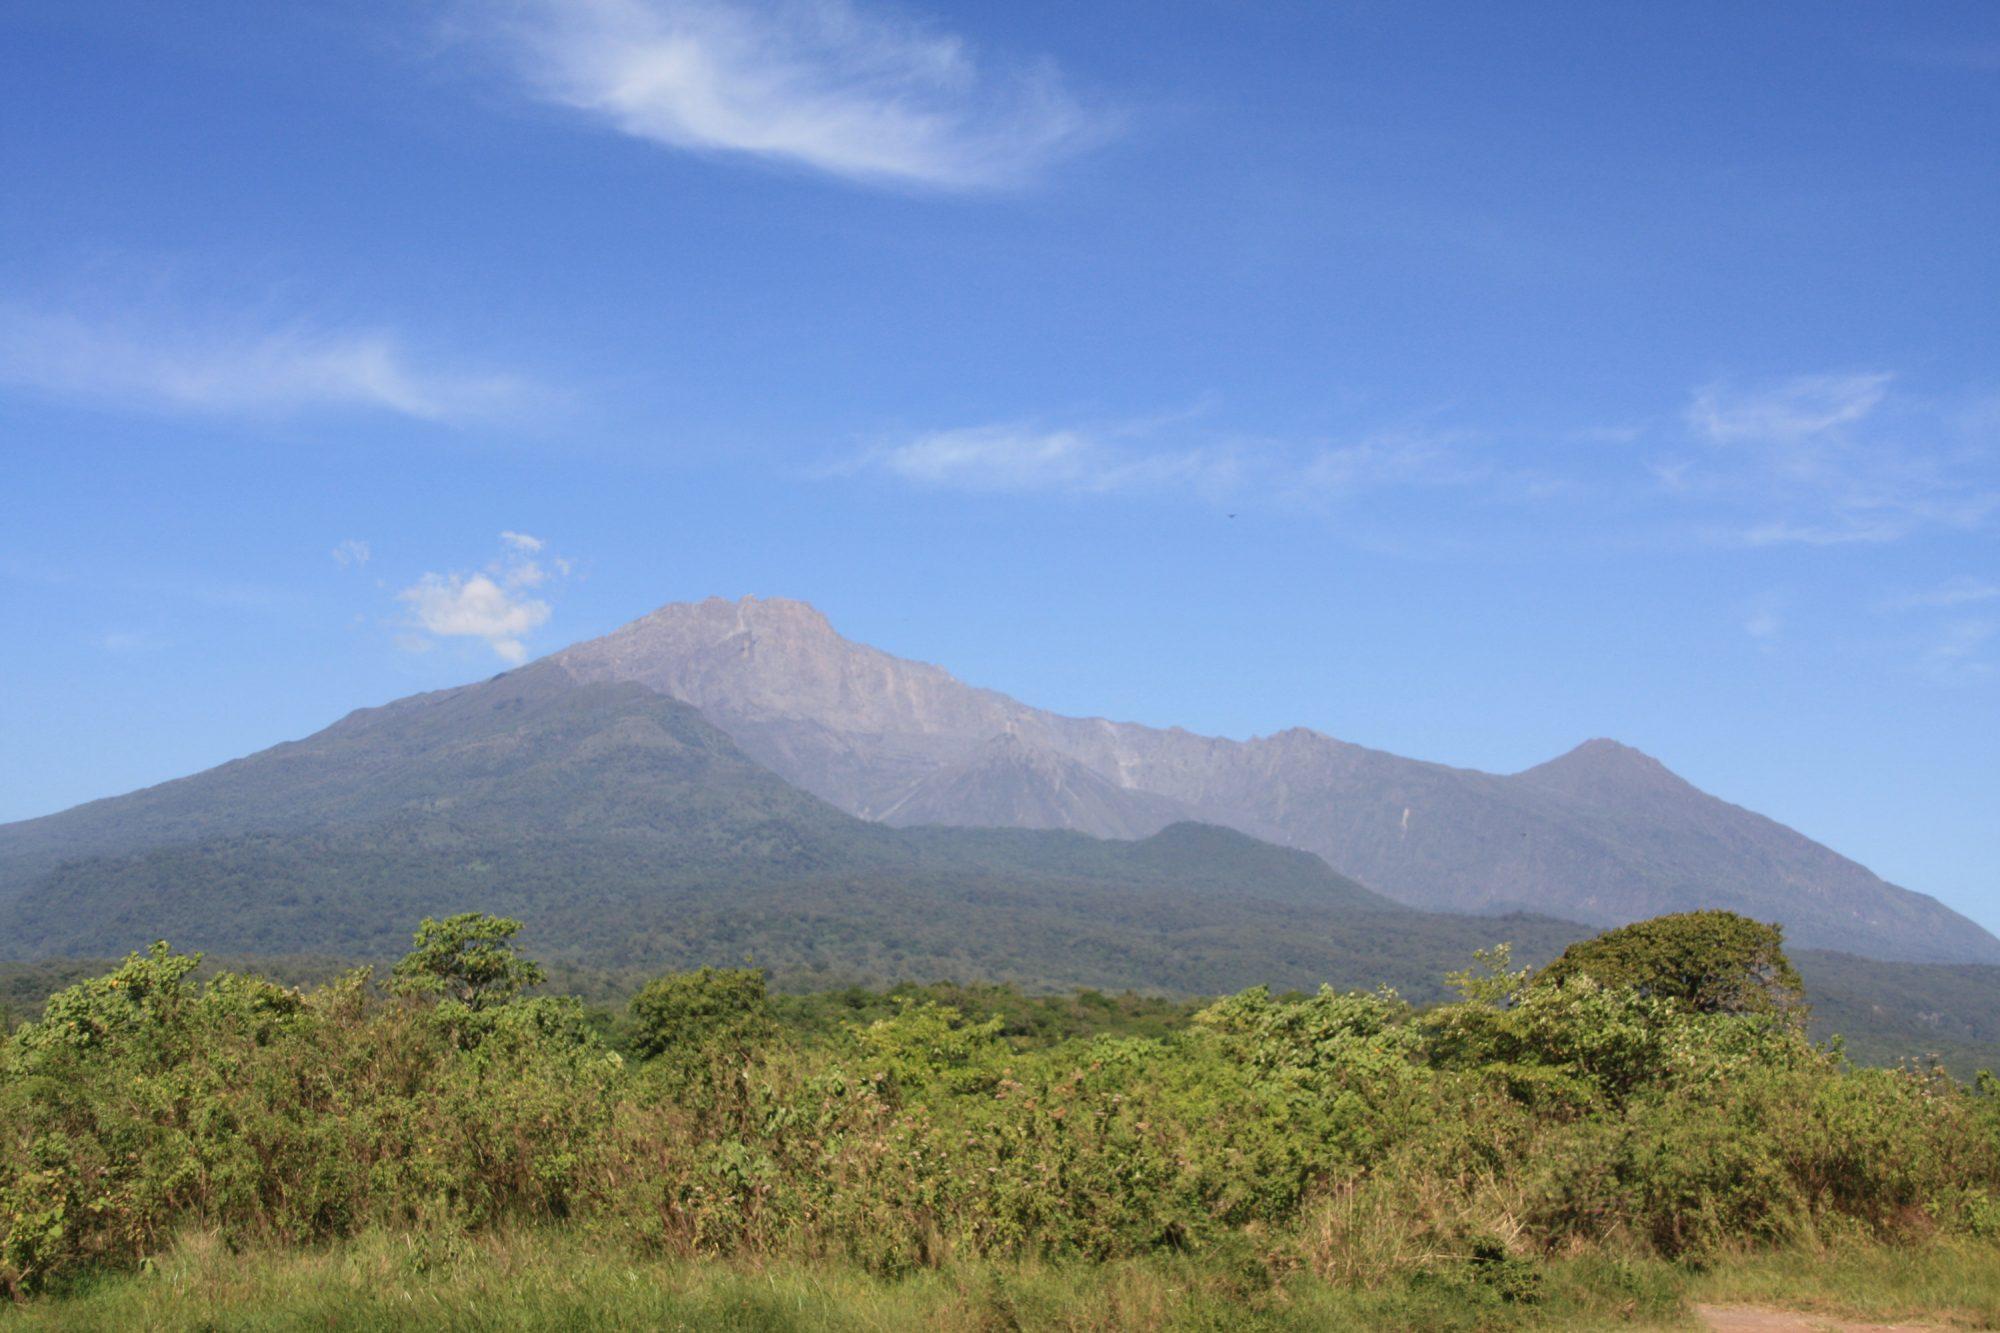 Erster Blick auf den Mount Meru, Tansania, Afrika